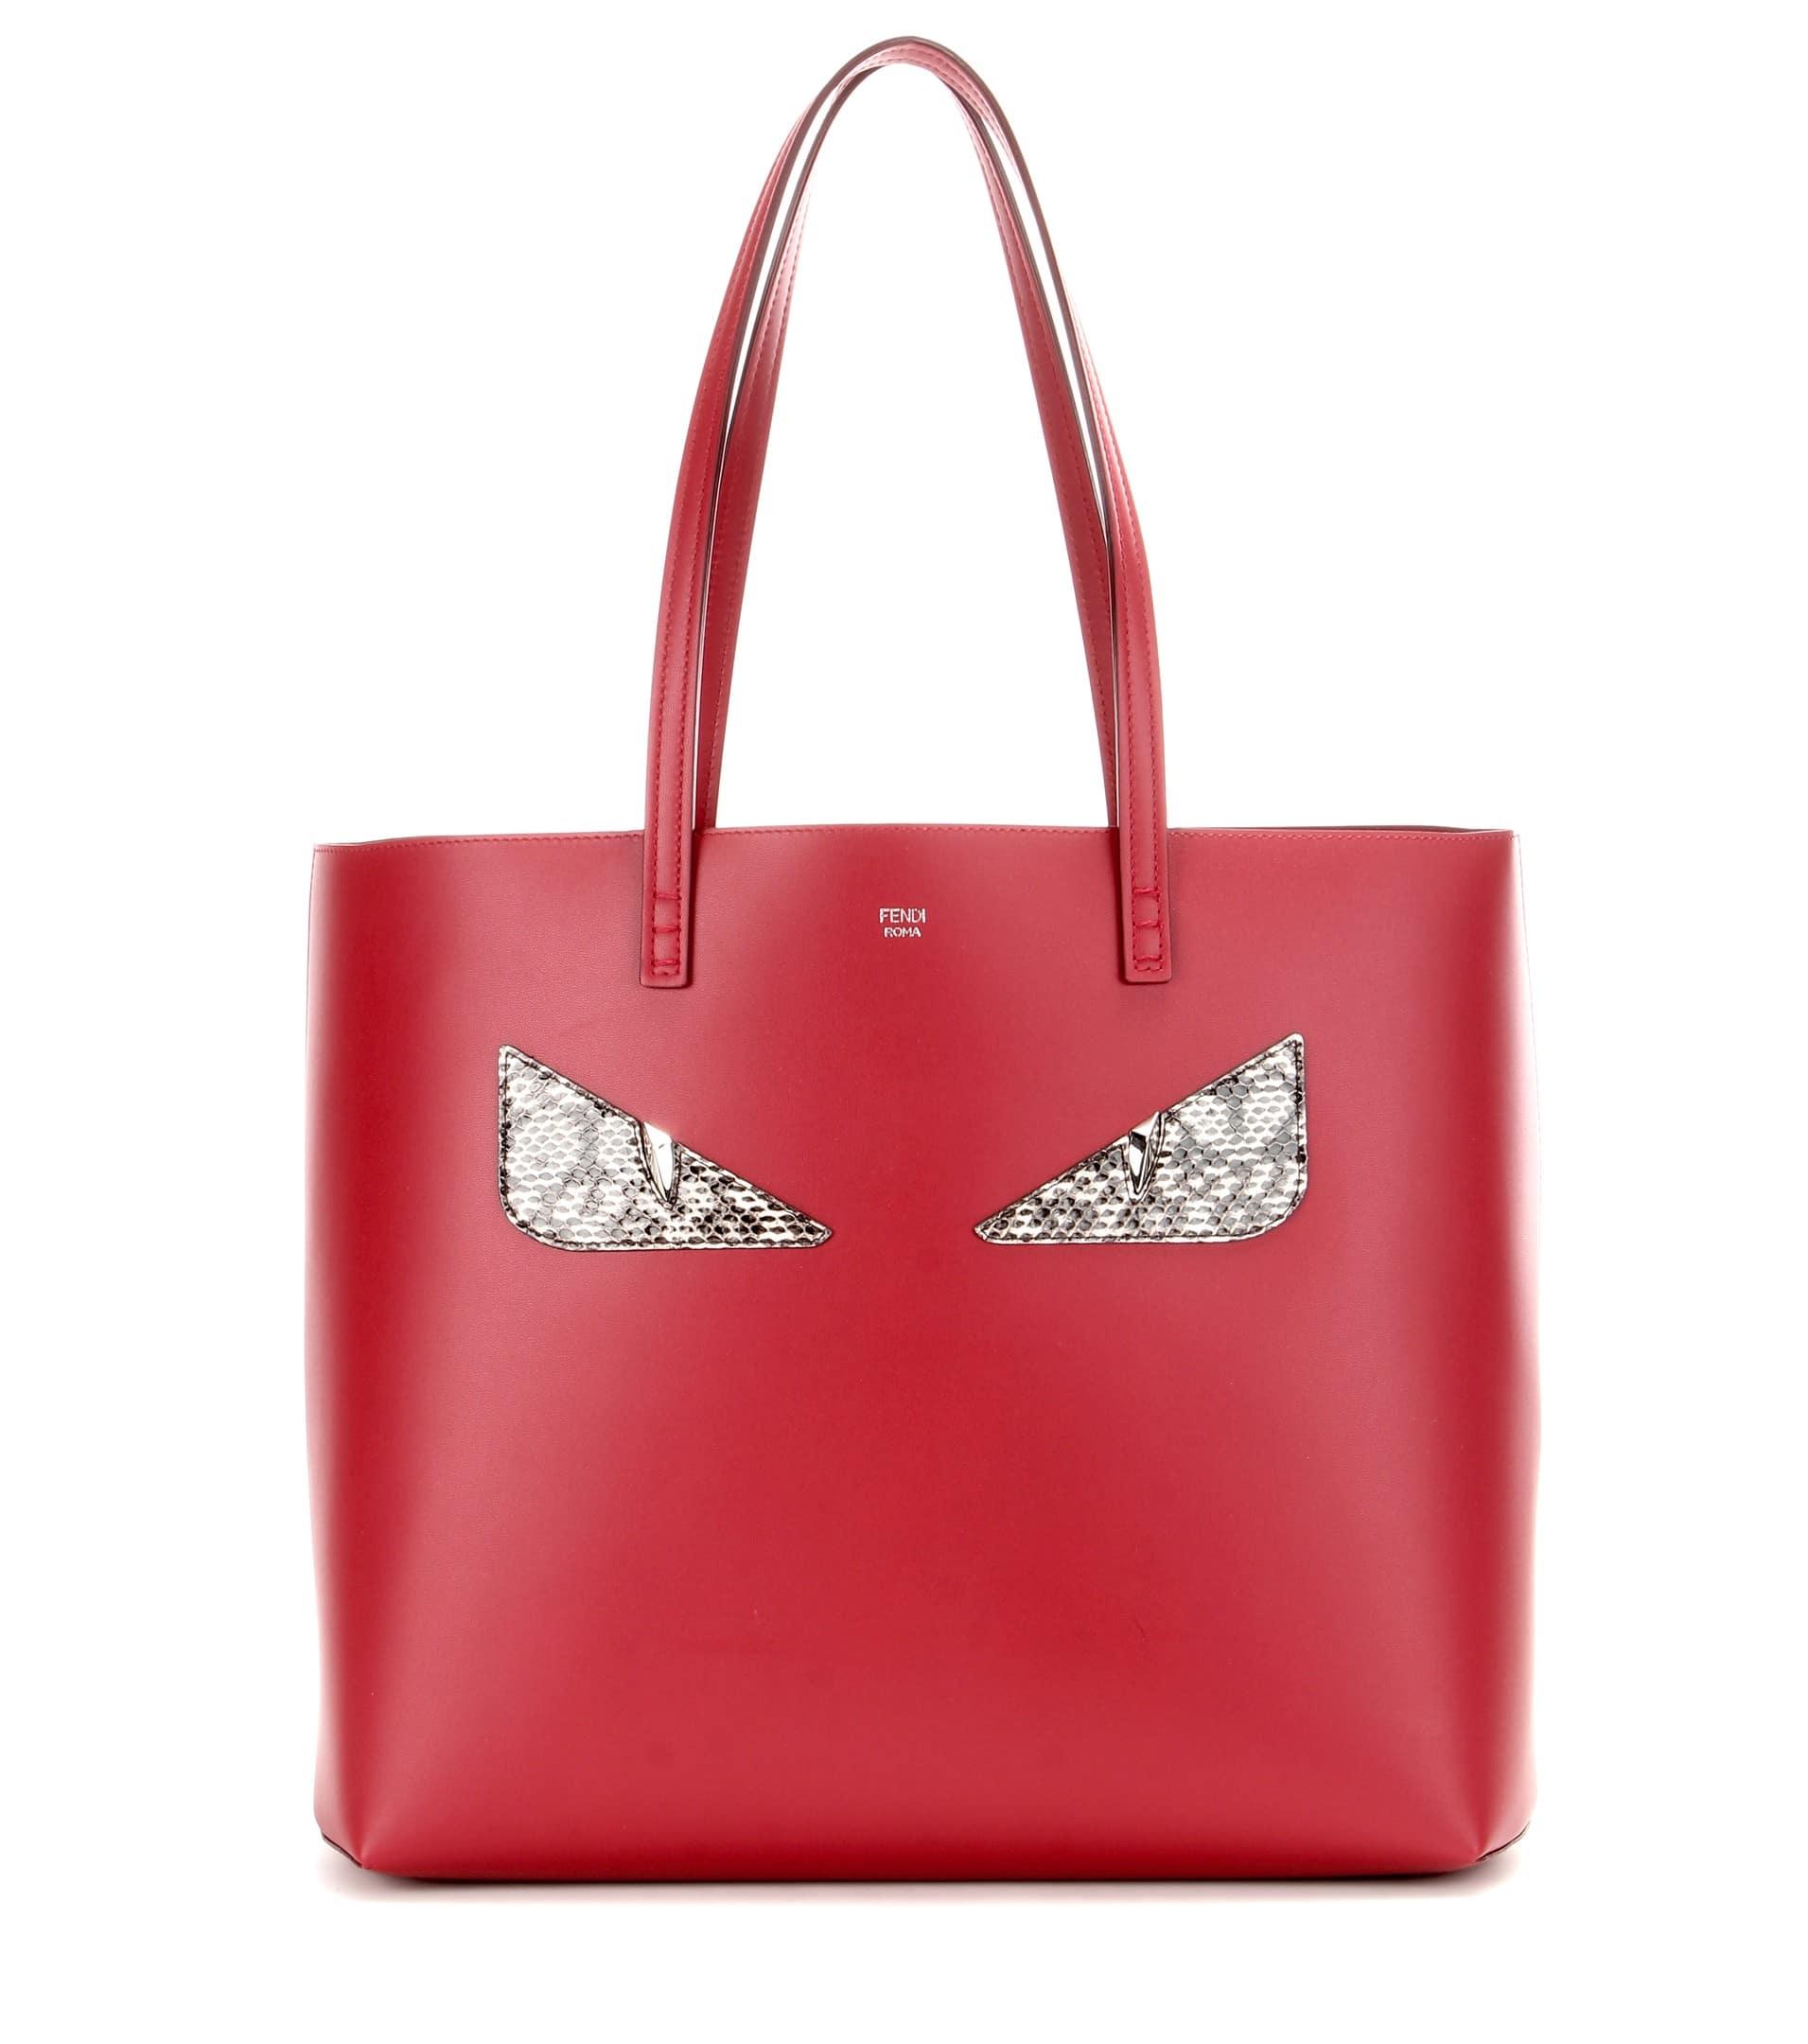 3daf82e7a584 Fendi Red Monster Face Medium Roll Tote Bag